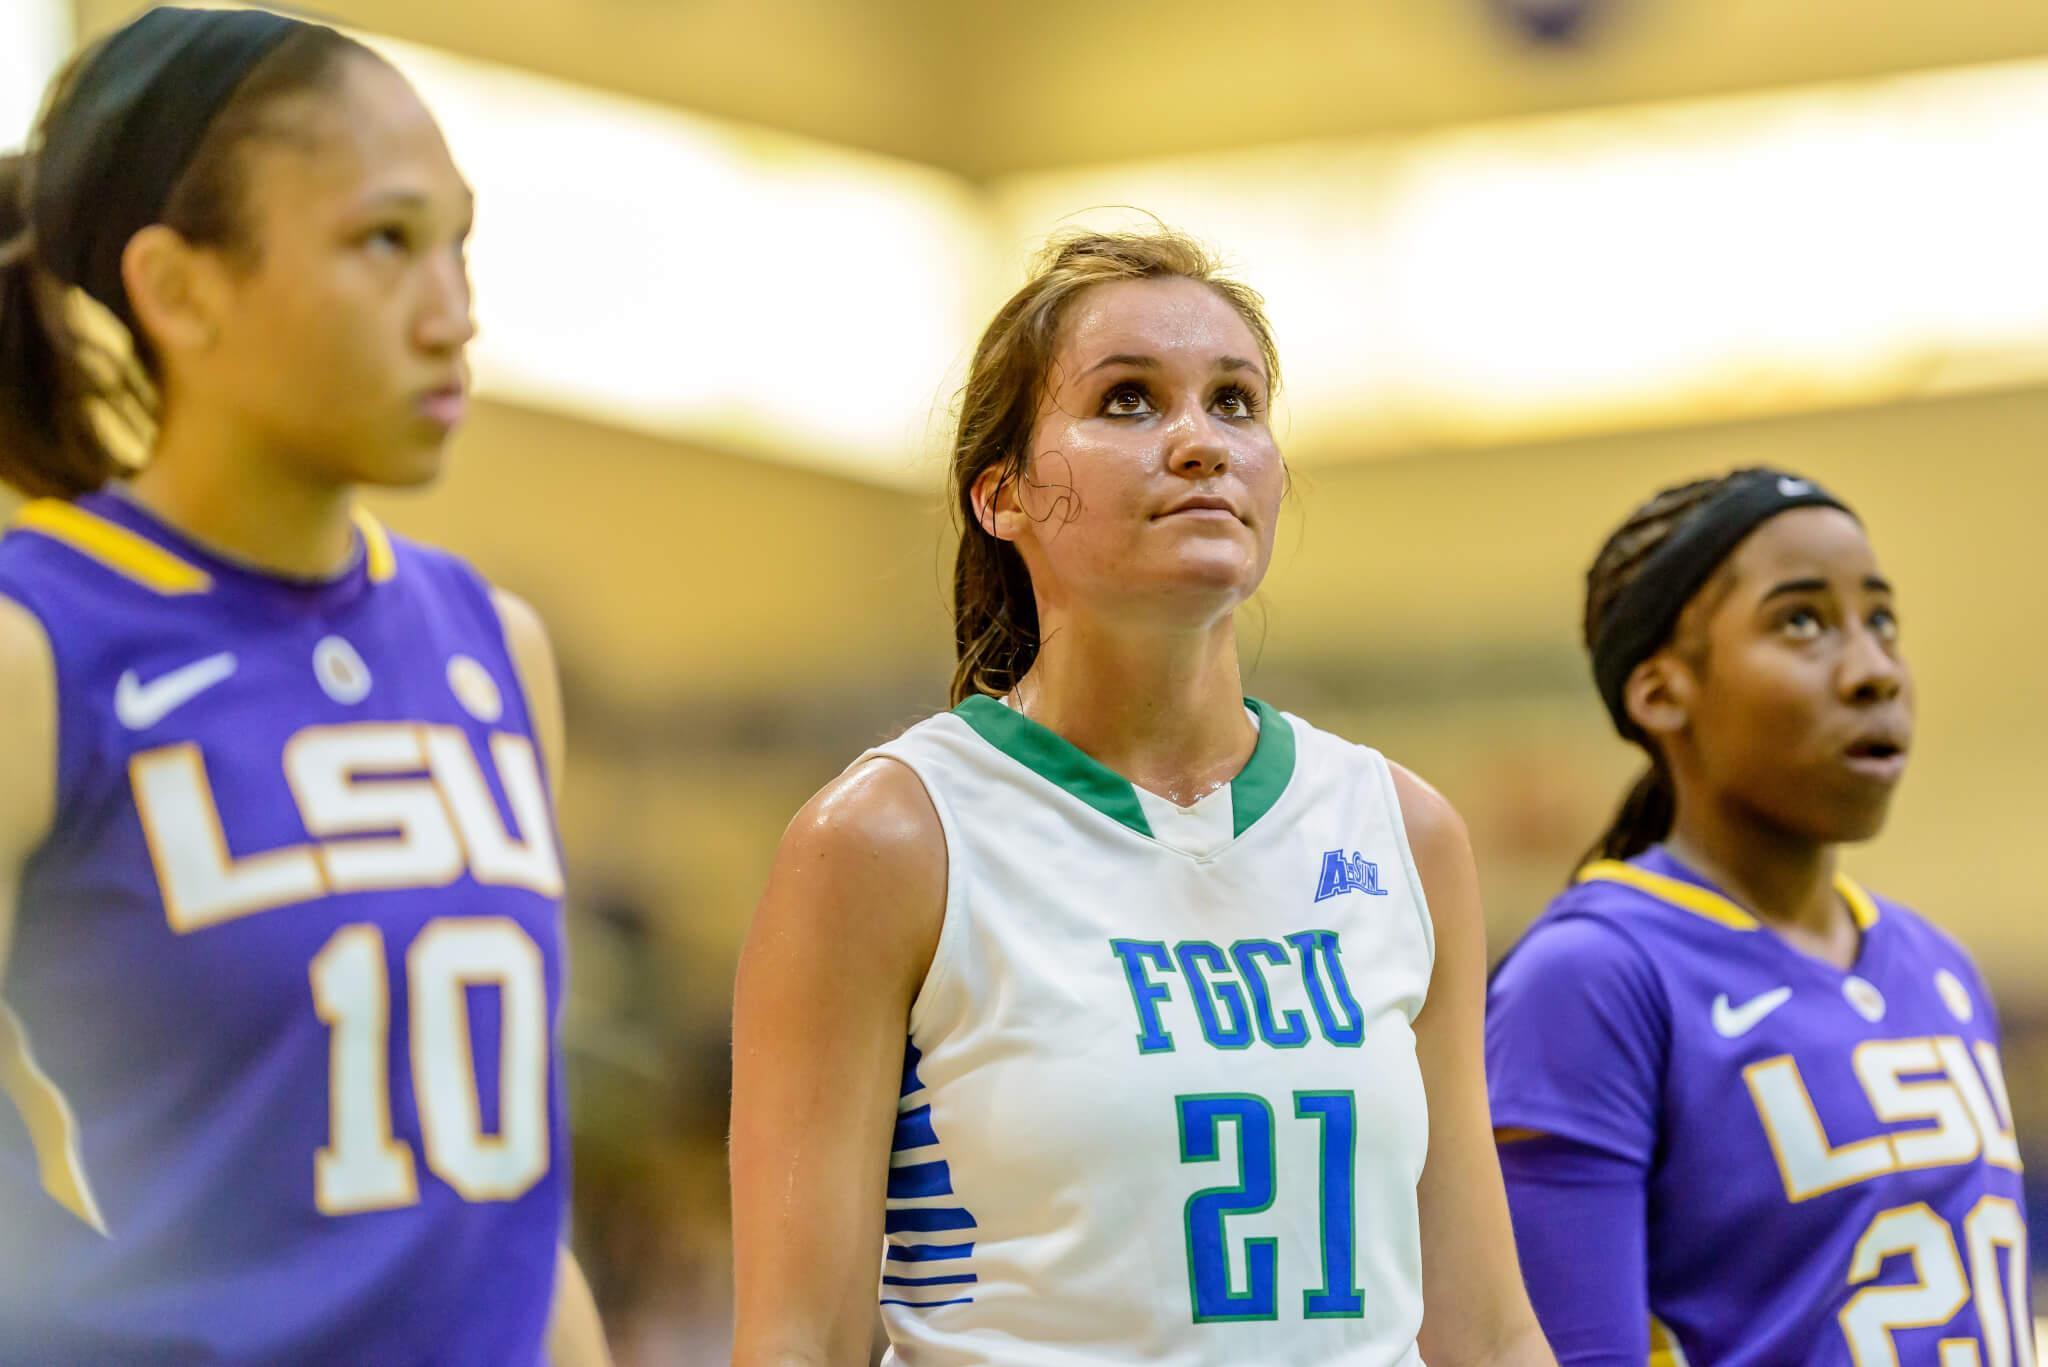 FGCU freshman Jamie Gluesing fills crucial role